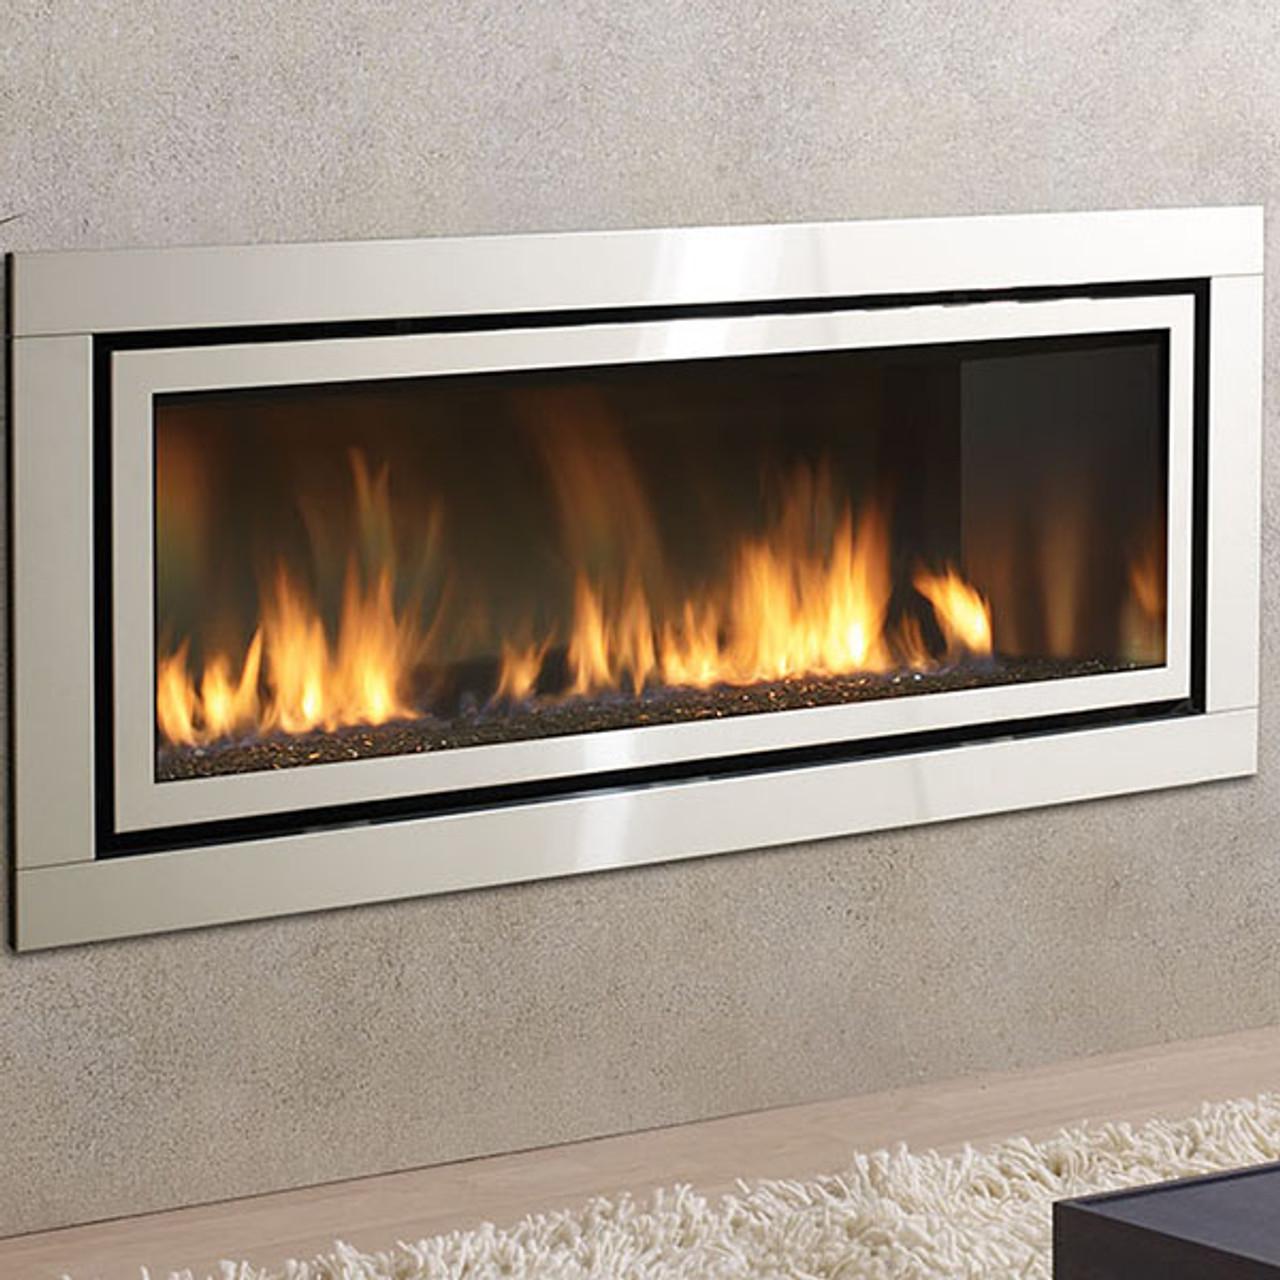 Outstanding Regency Horizon Hz54E Gas Fireplace Westchester Interior Design Ideas Jittwwsoteloinfo